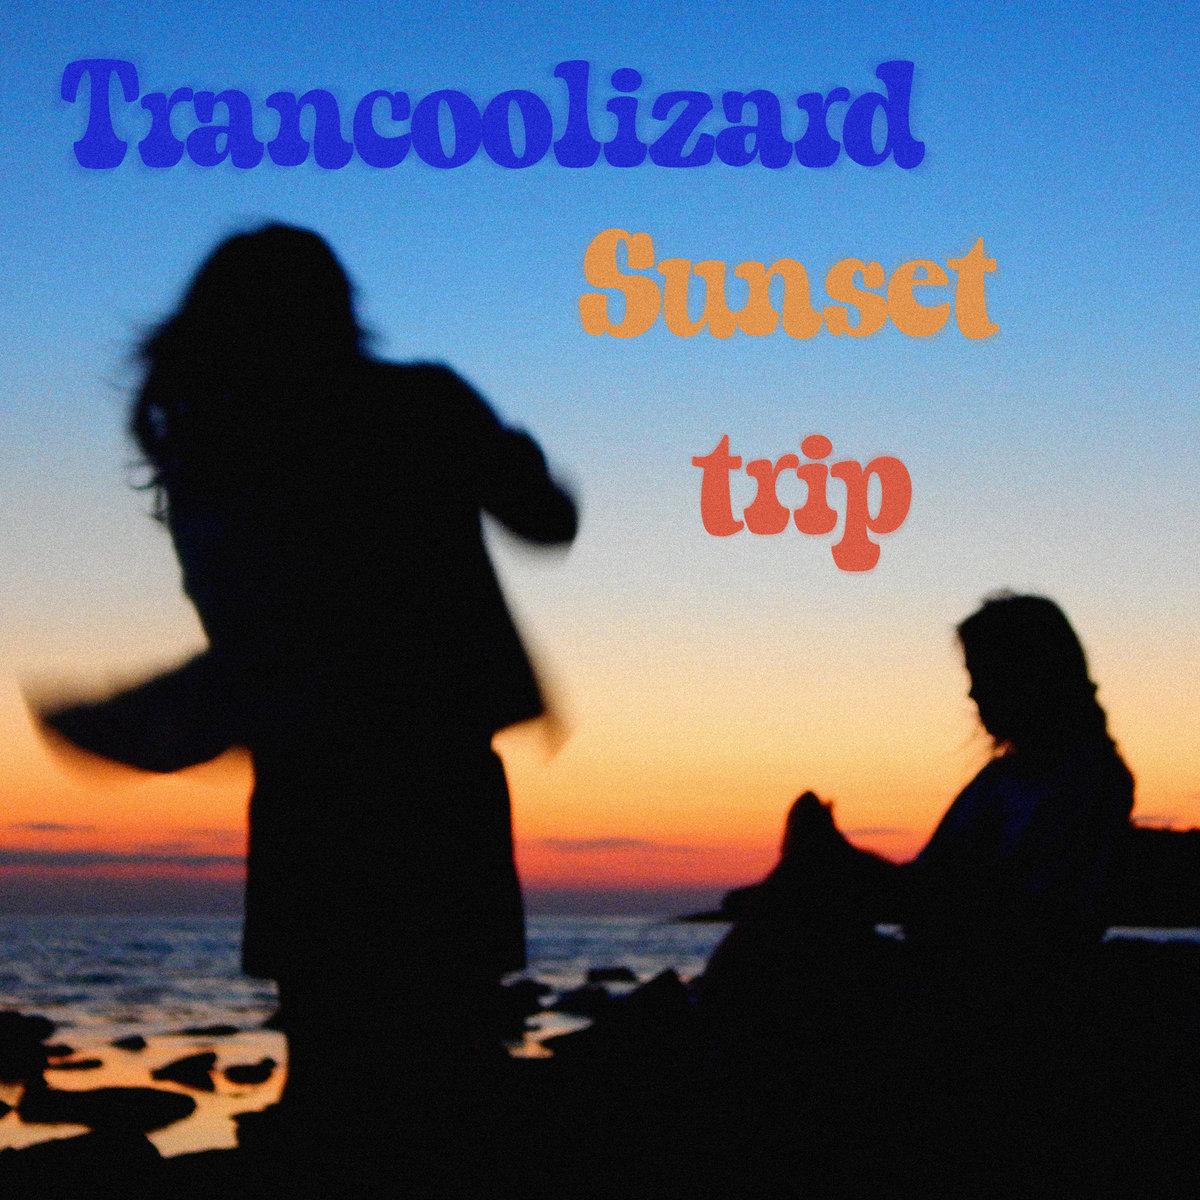 Trancoolizard